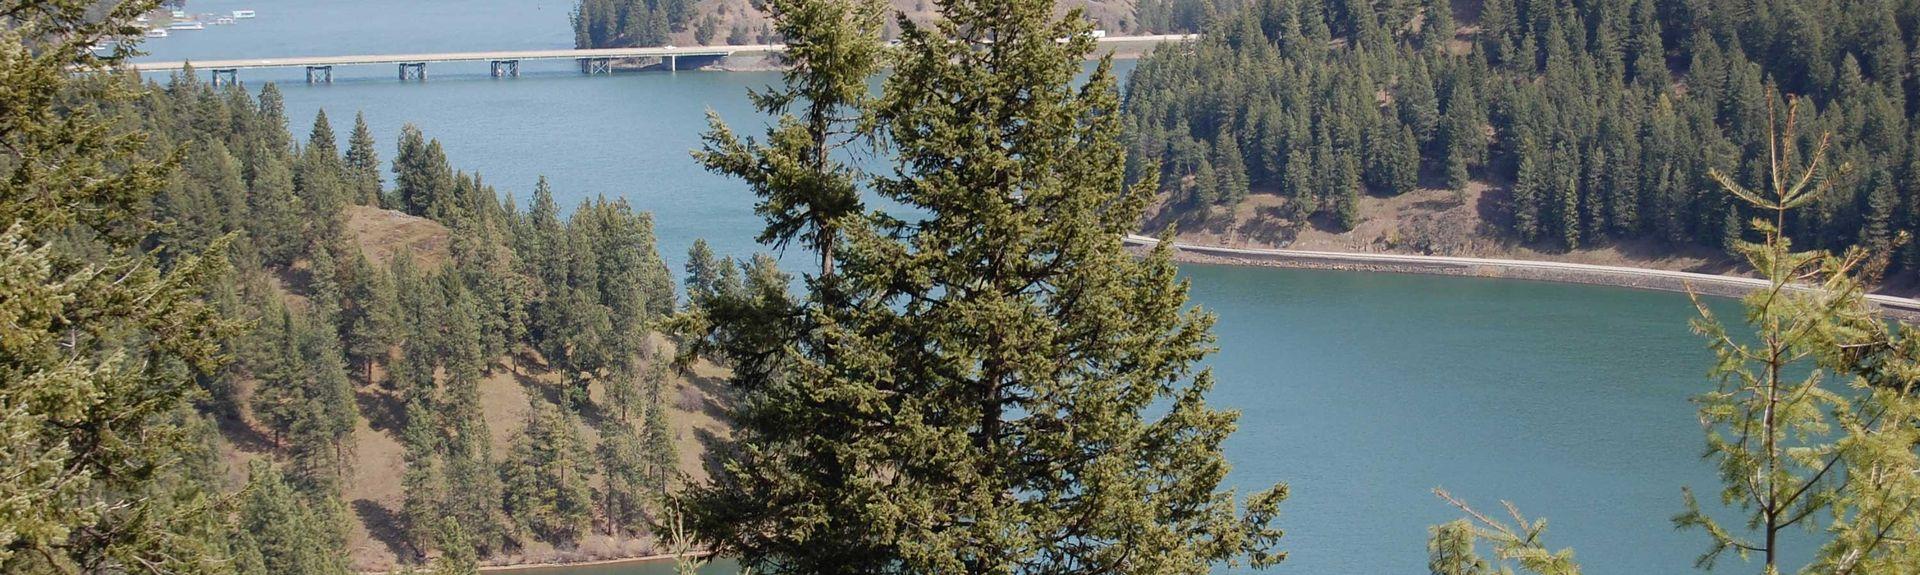 Cataldo, Idaho, United States